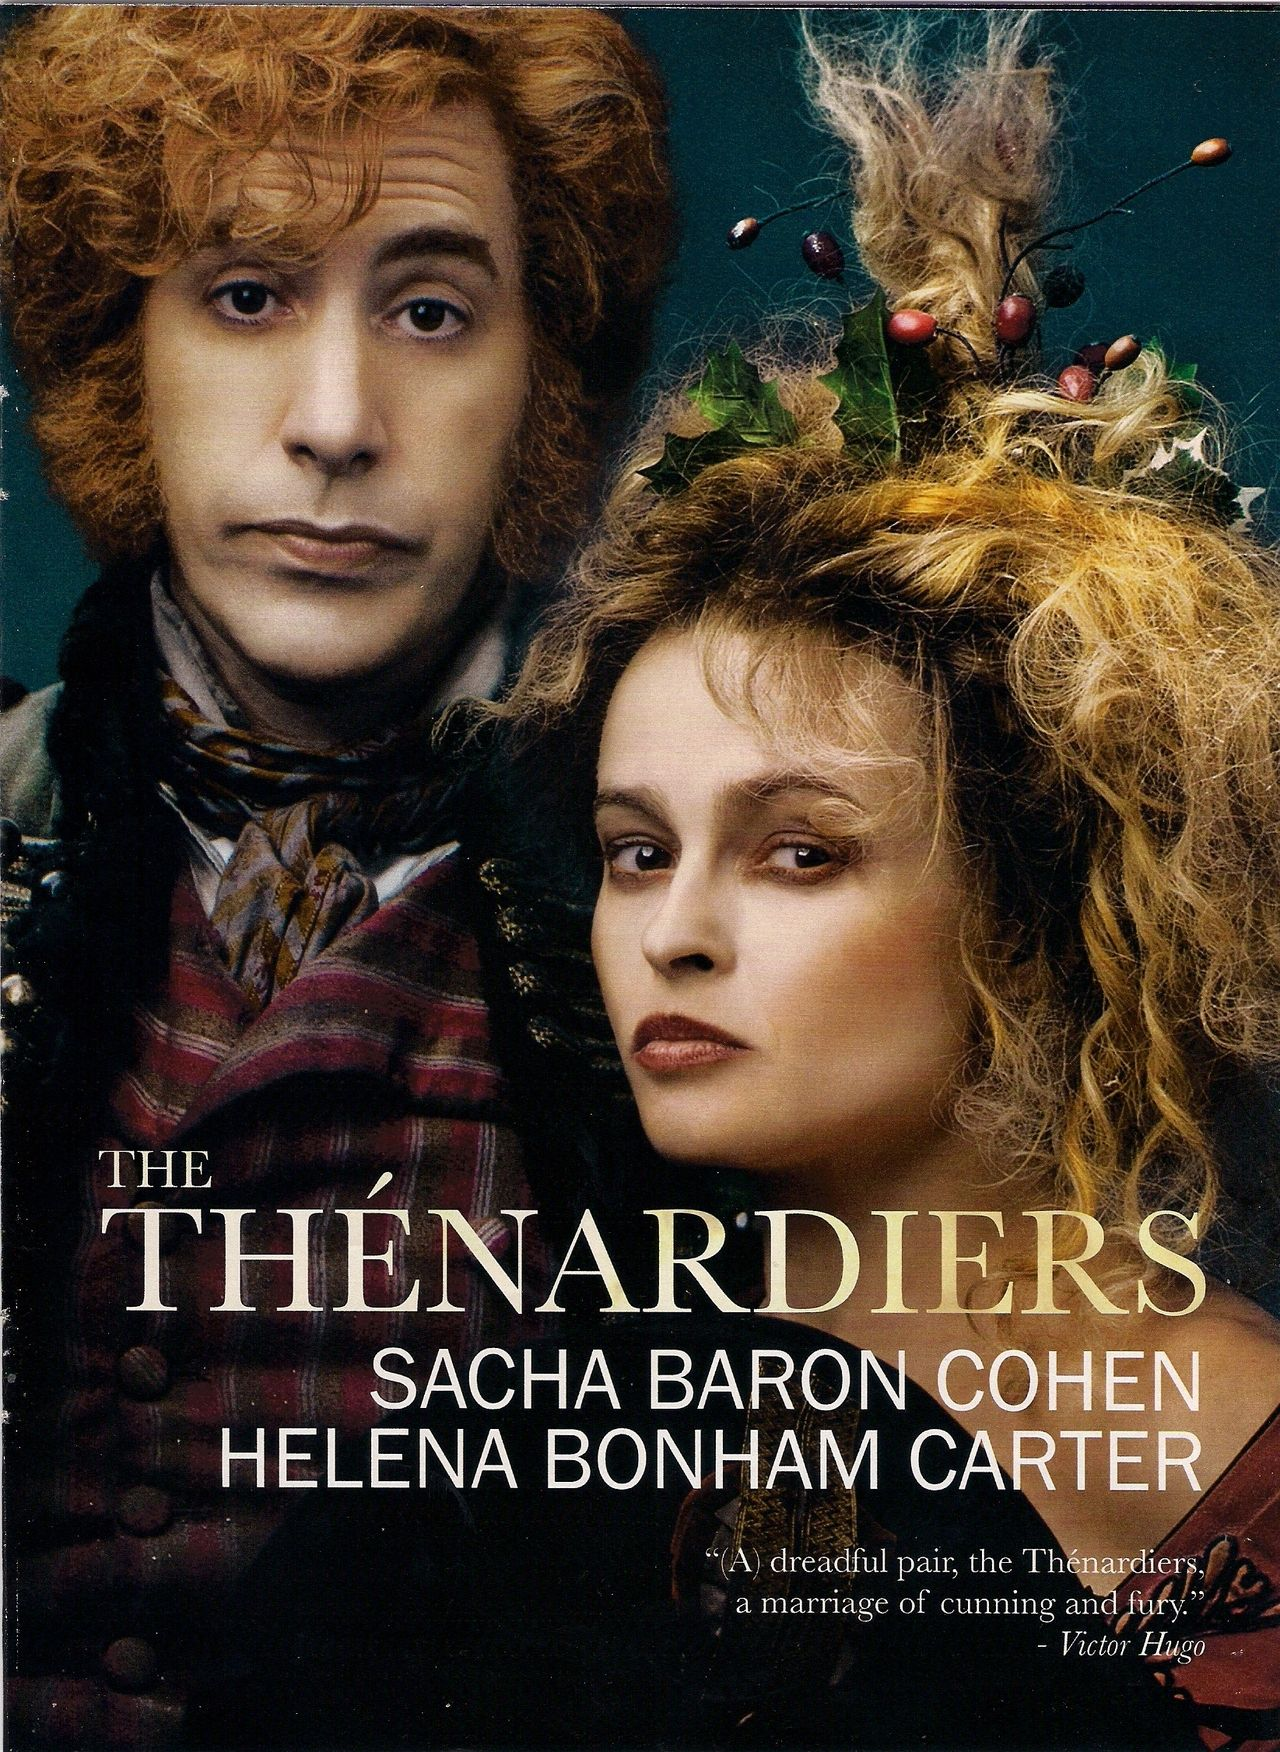 Les Mis 2012 Helena Bonham Carter Sacha Baron Cohen The Thenardiers Les Miserables Les Miserables 2012 Helena Bonham Carter